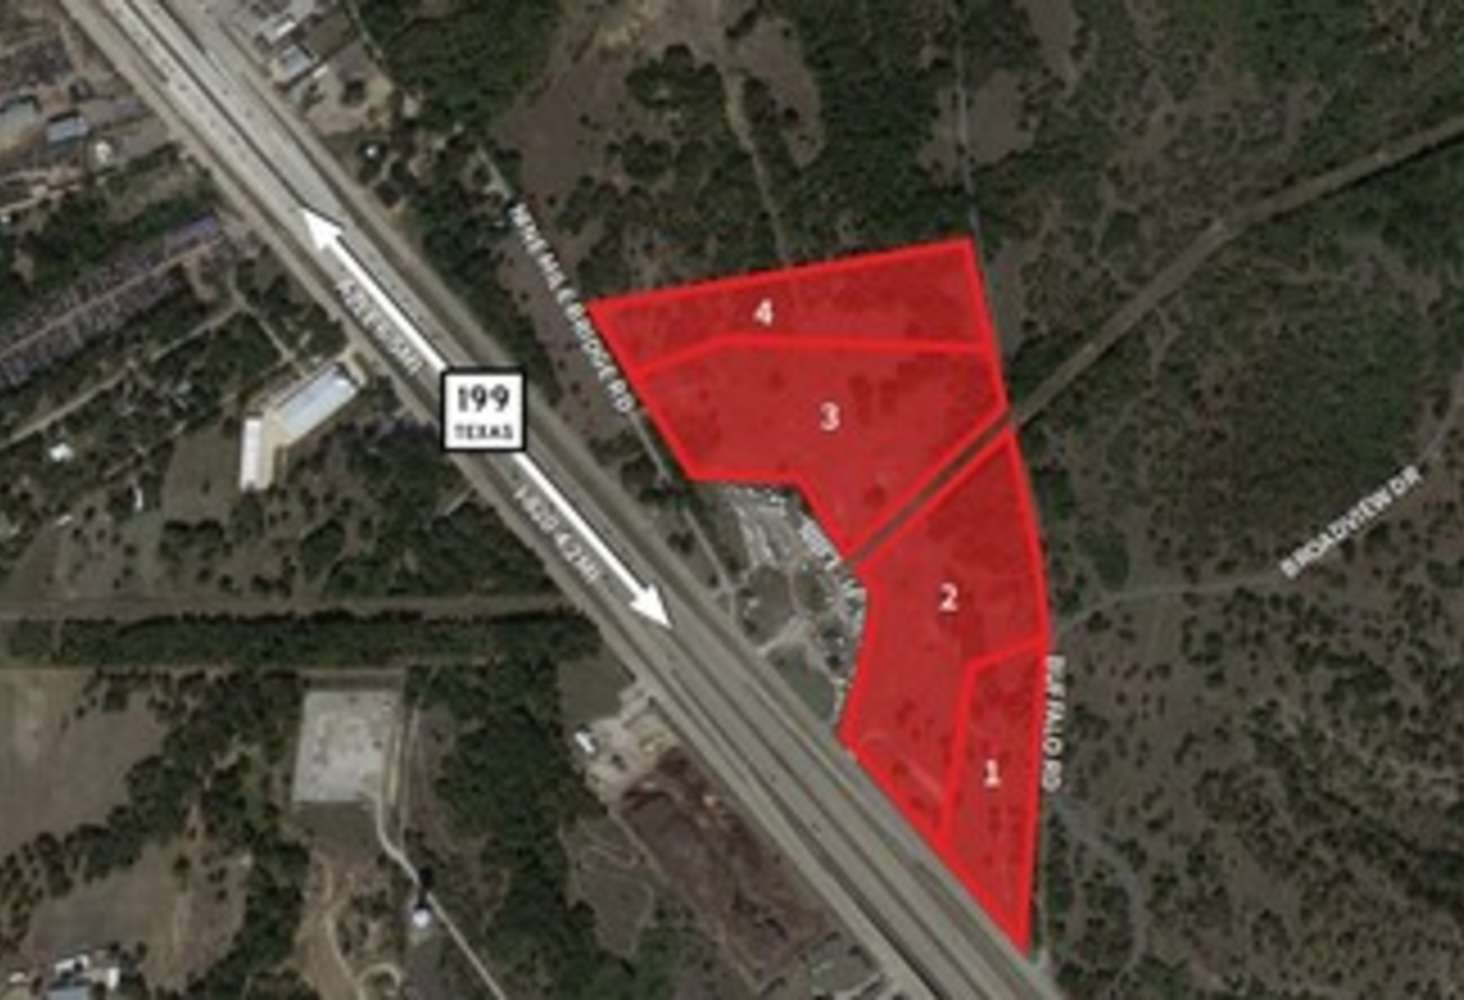 Land Fort worth, 76135 - 8900 Jacksboro Hwy